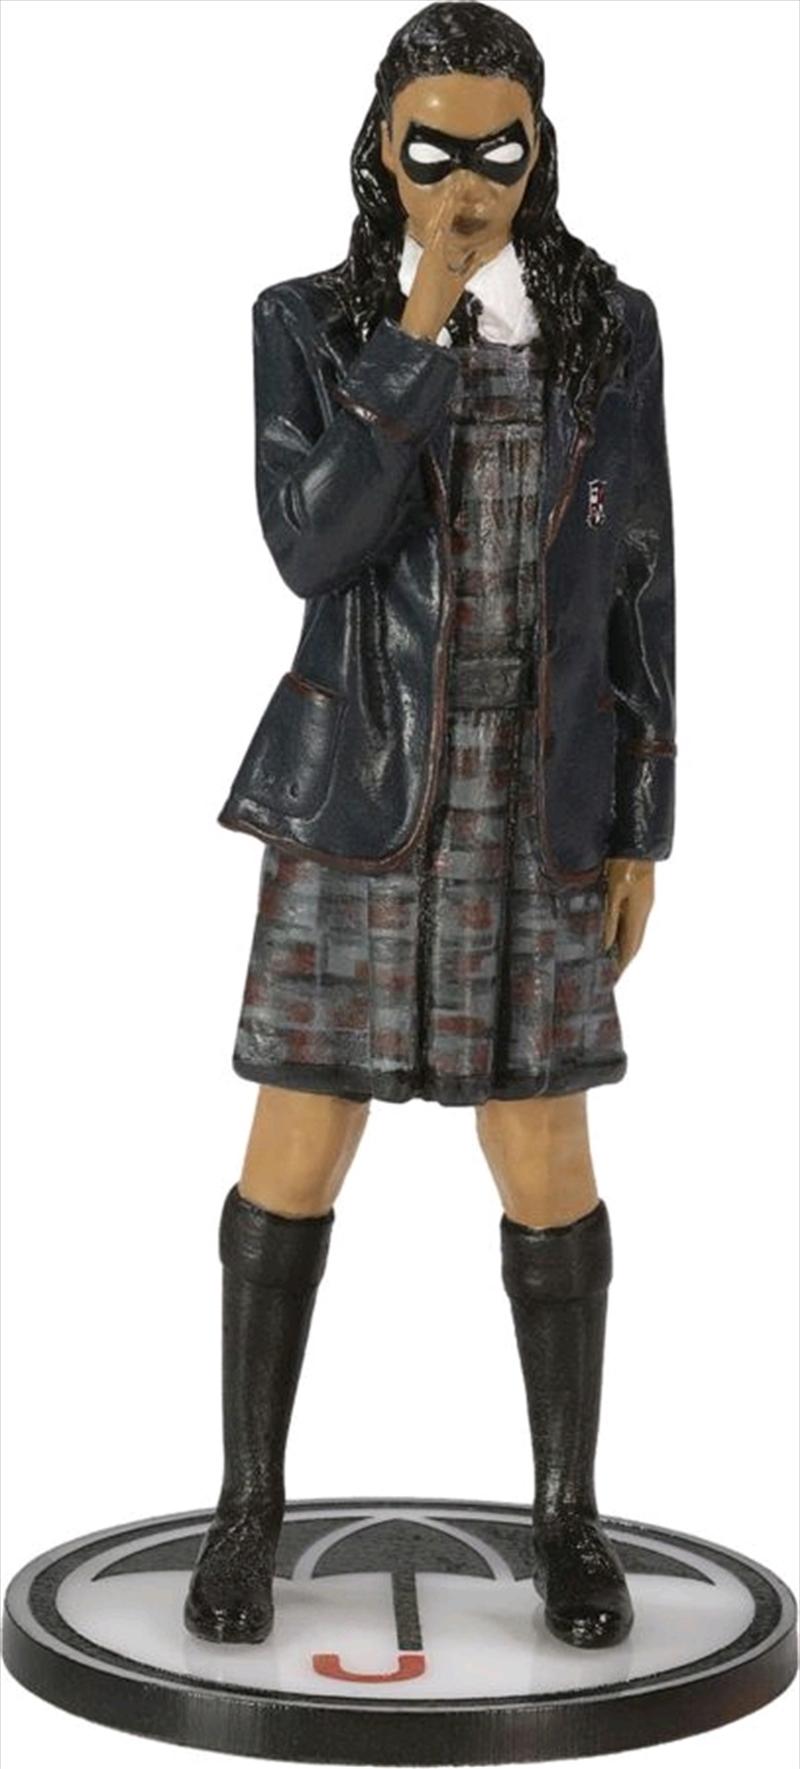 Umbrella Academy - #3 Allison Figure Replica | Merchandise